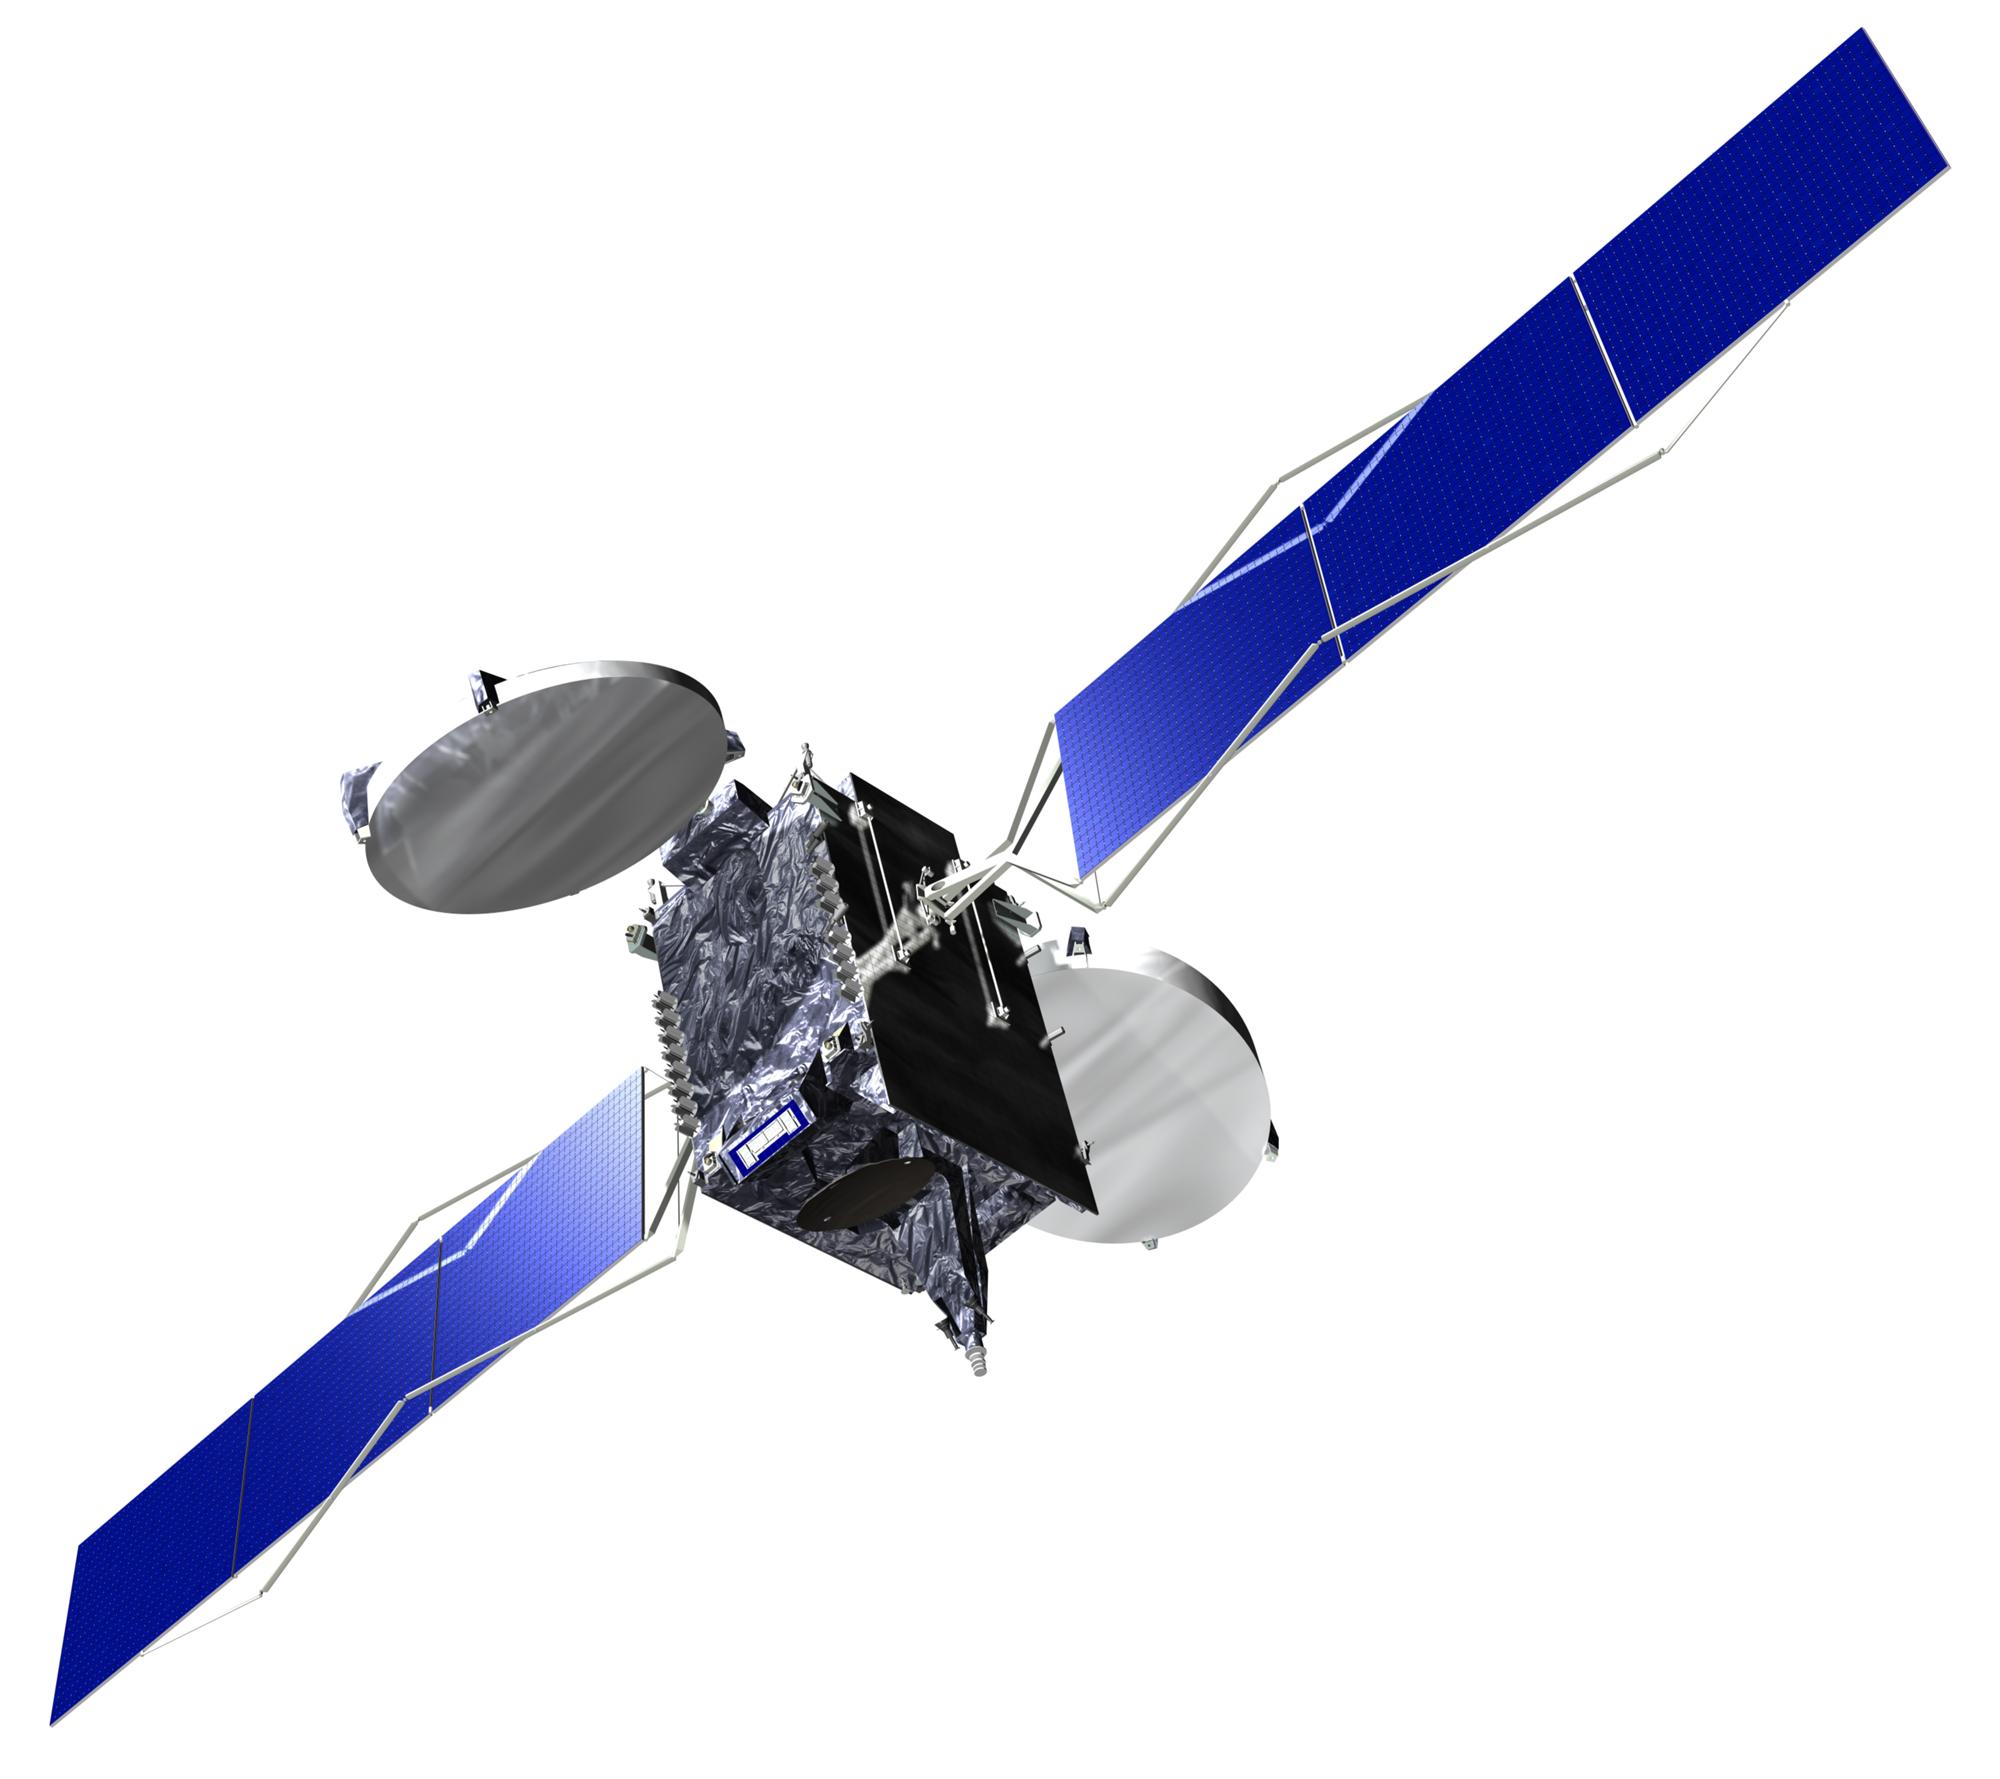 Space Satellite Png Image #40920 - Satellite, Transparent background PNG HD thumbnail